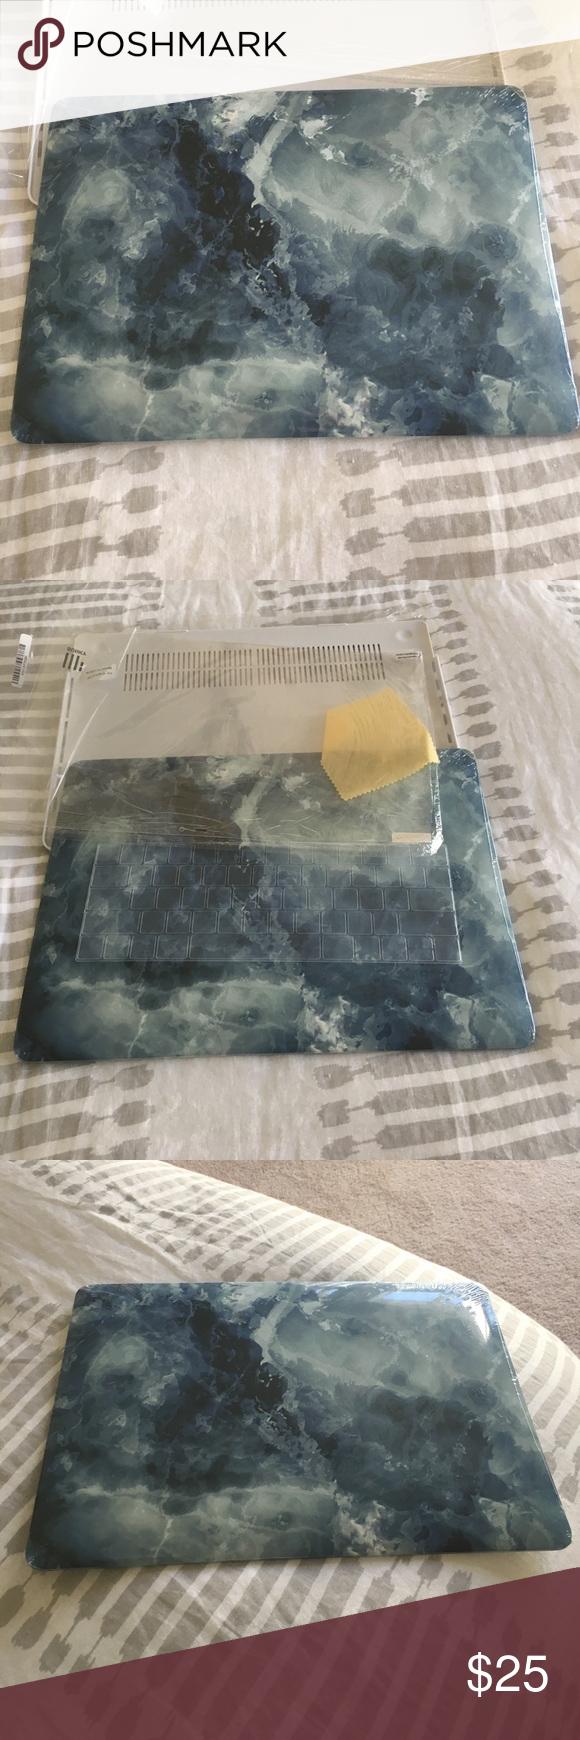 MacBook Newest 15 Pro Case +Keyboard Skin +More BRAND NEW - Please